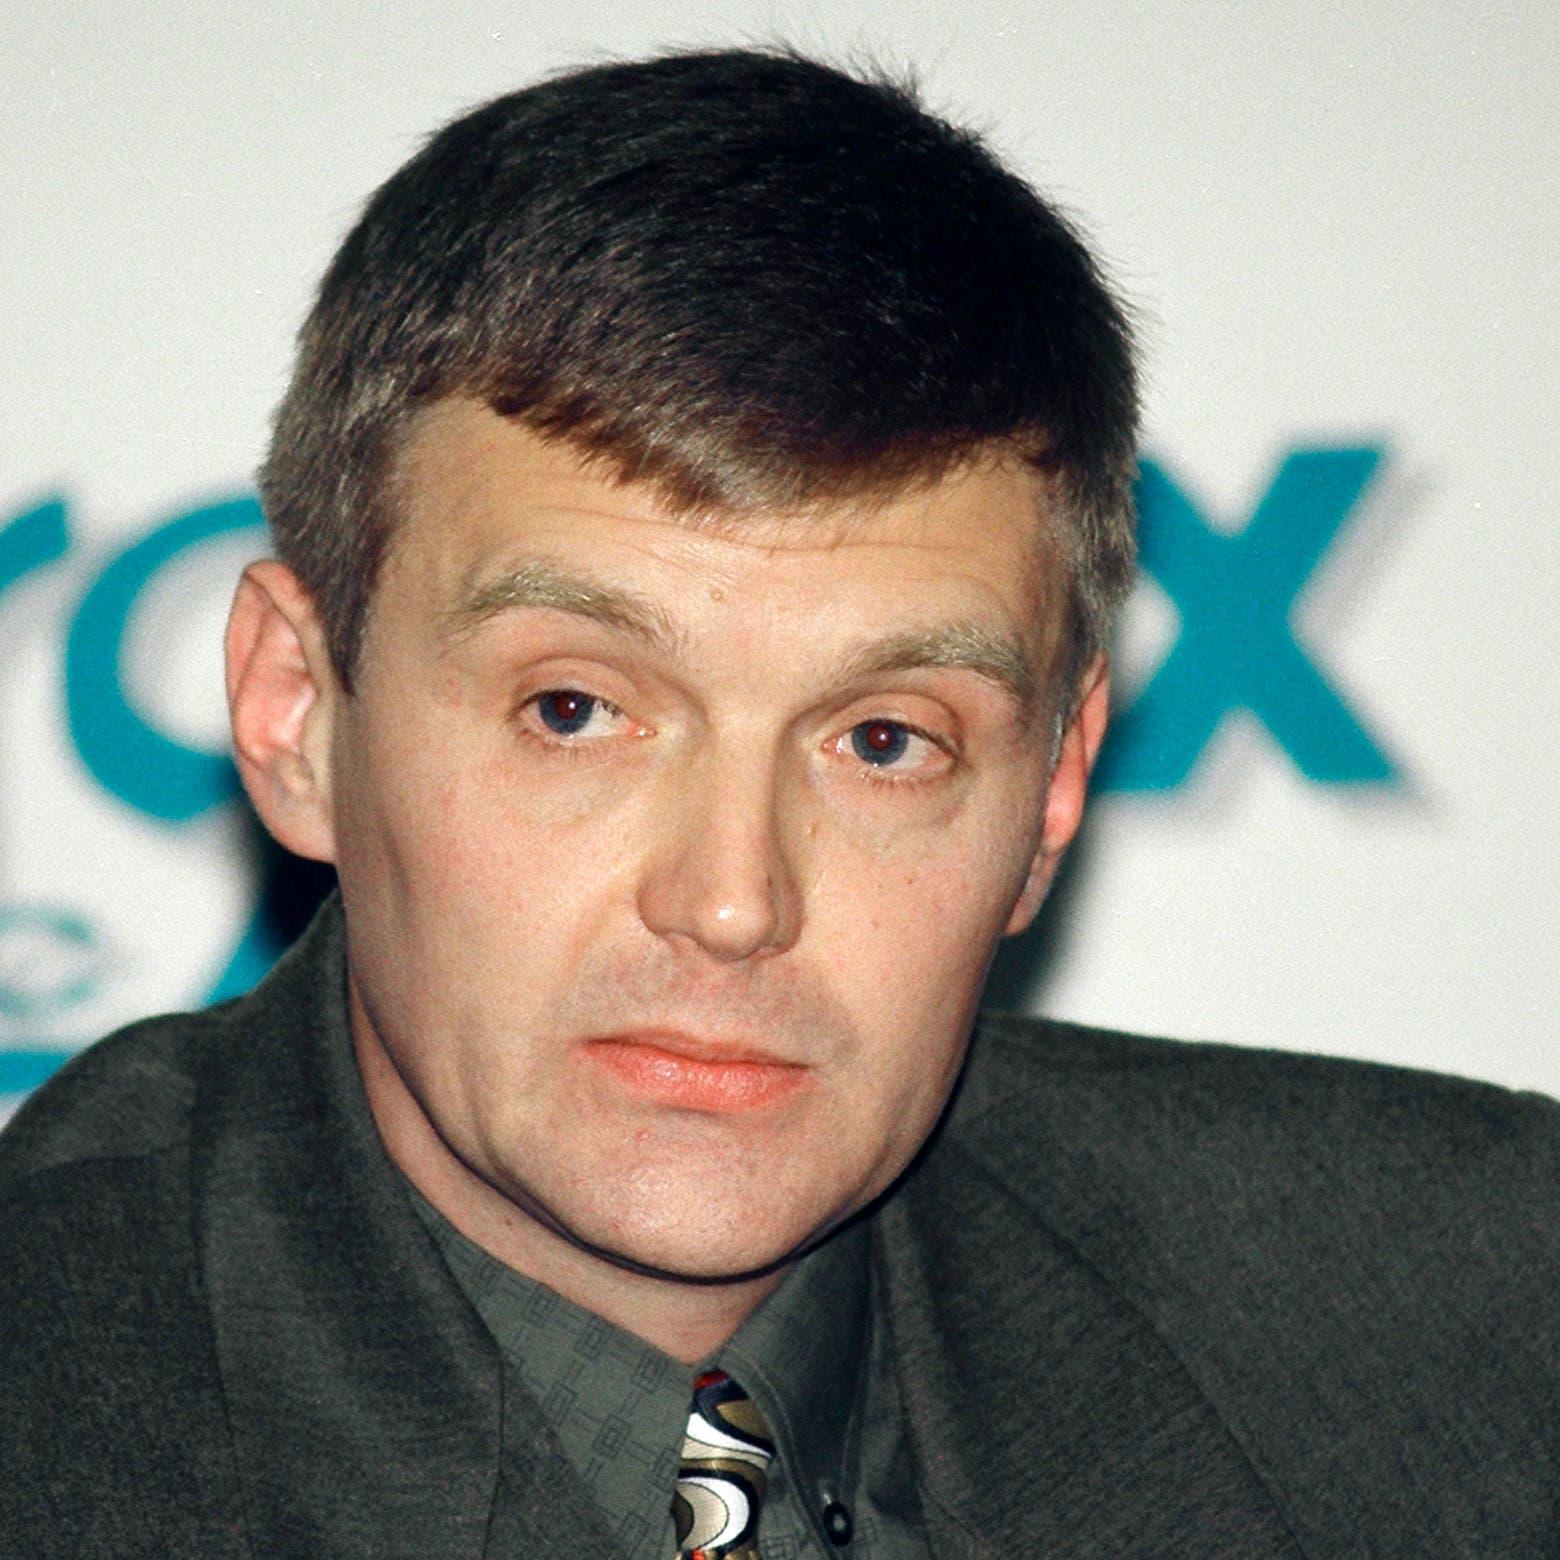 European court finds Russia guilty of Alexander Litvinenko's 2006 assassination